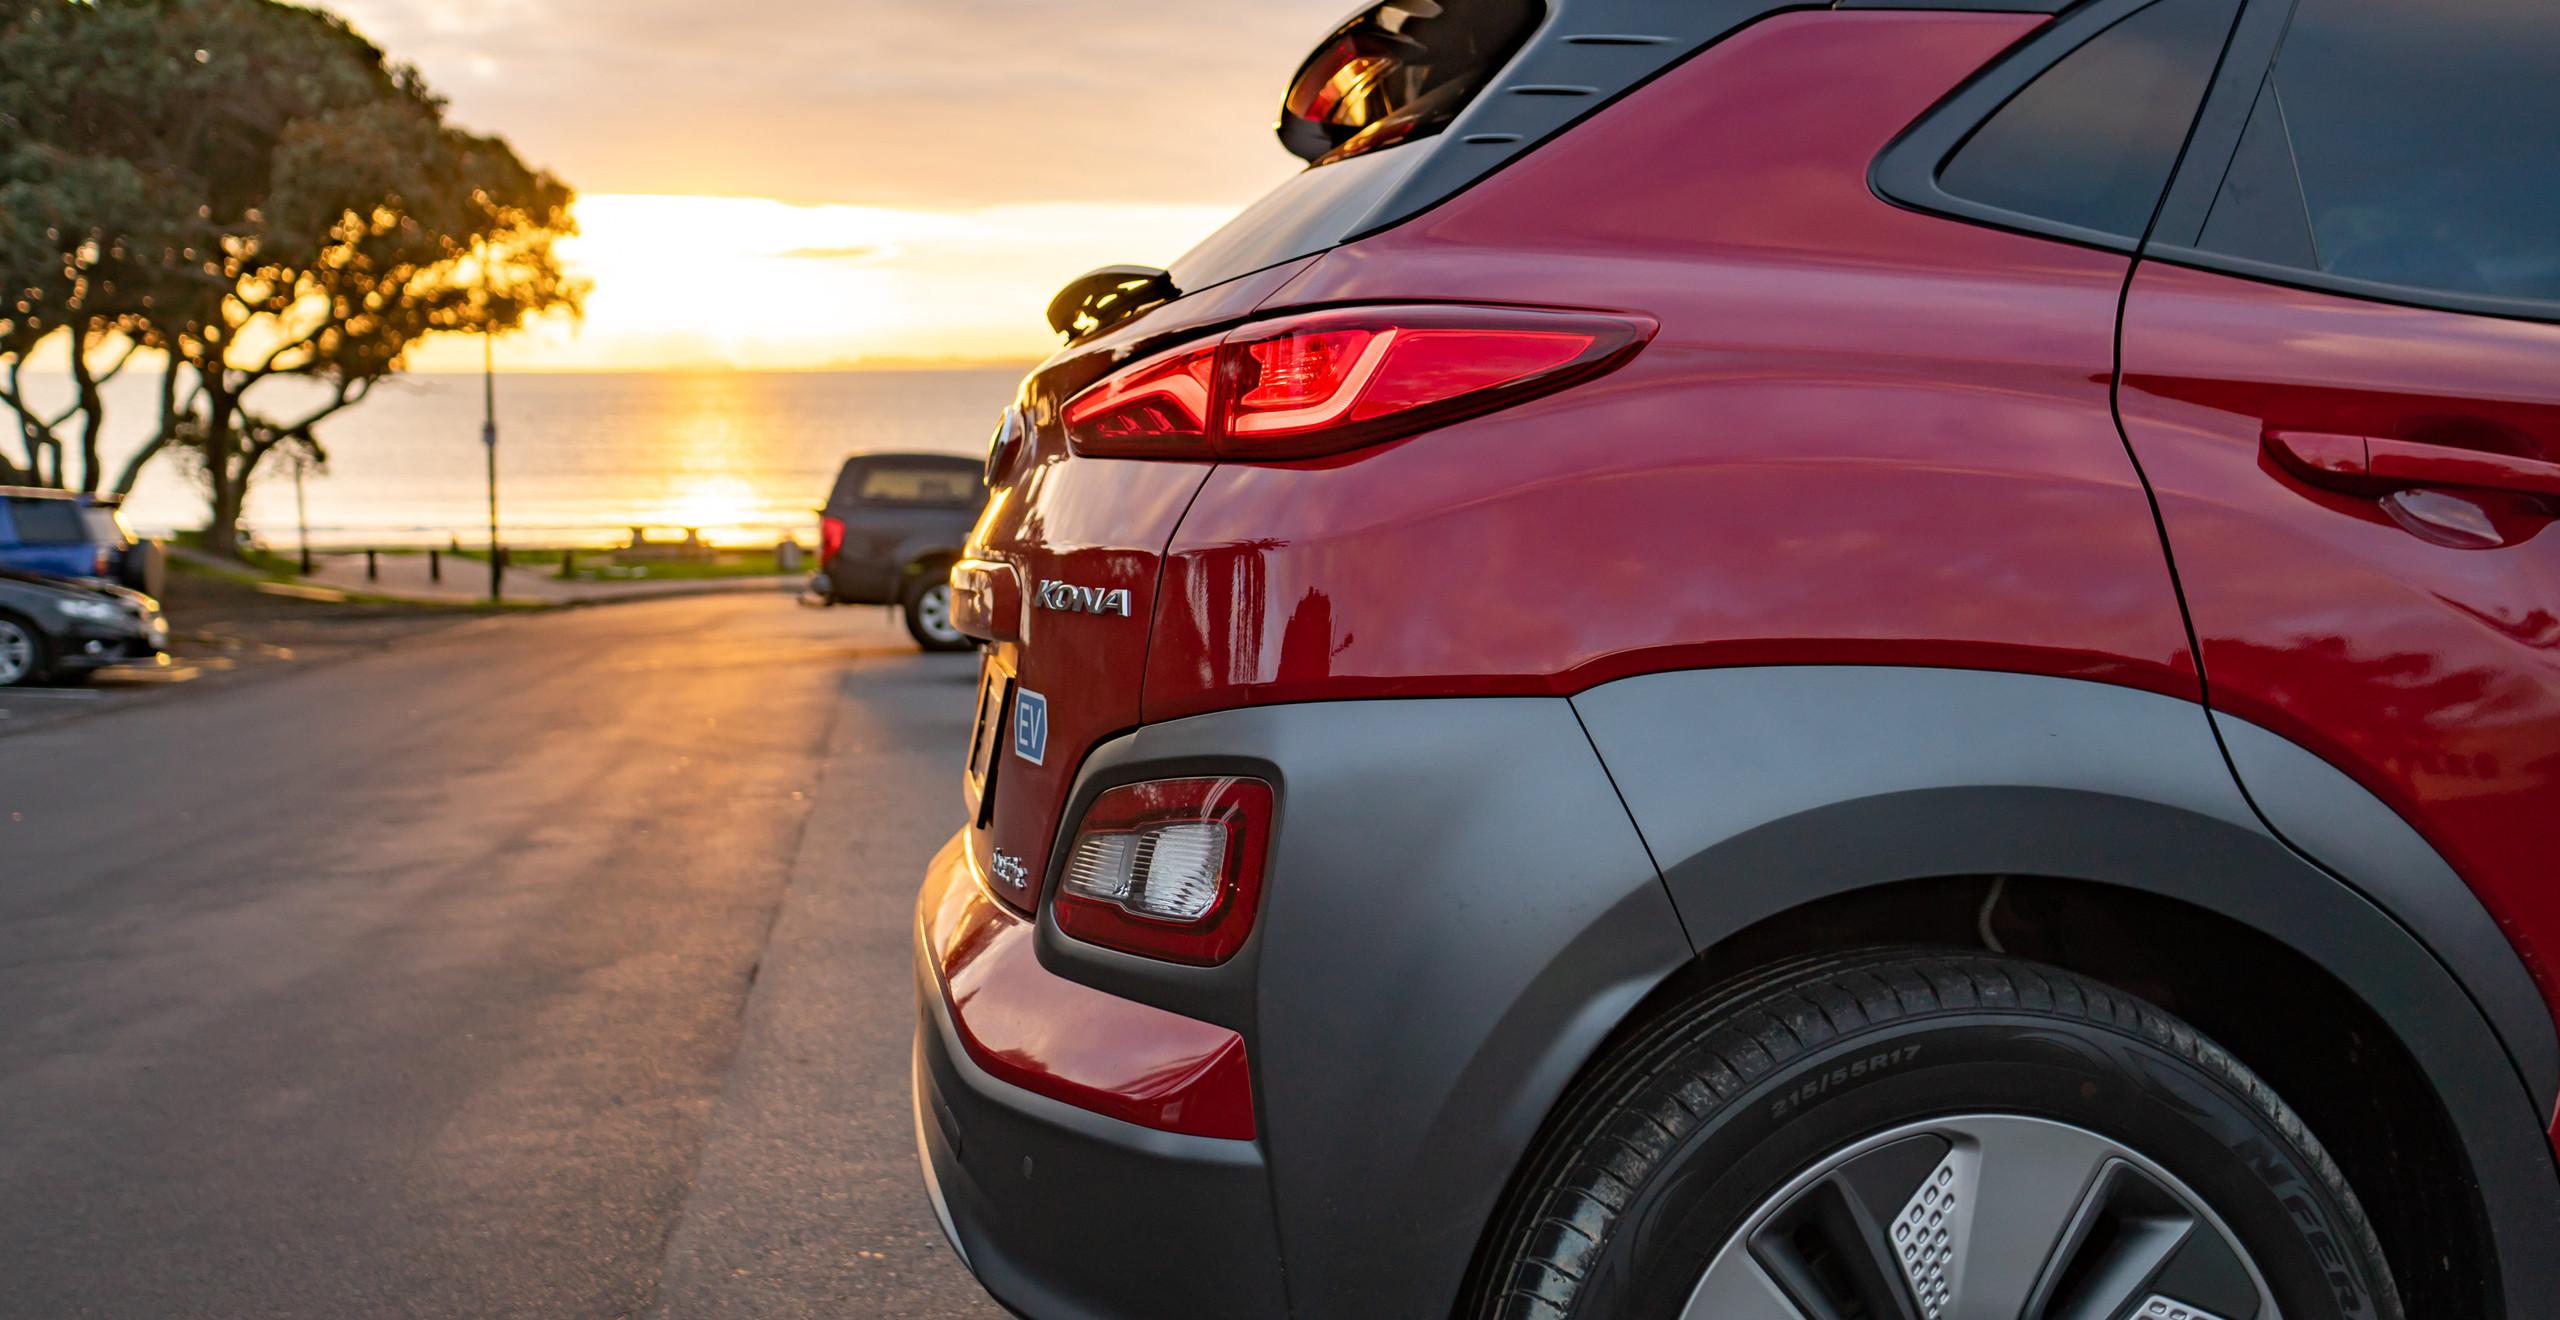 Hyundai Kona Electric rear end red sunrise